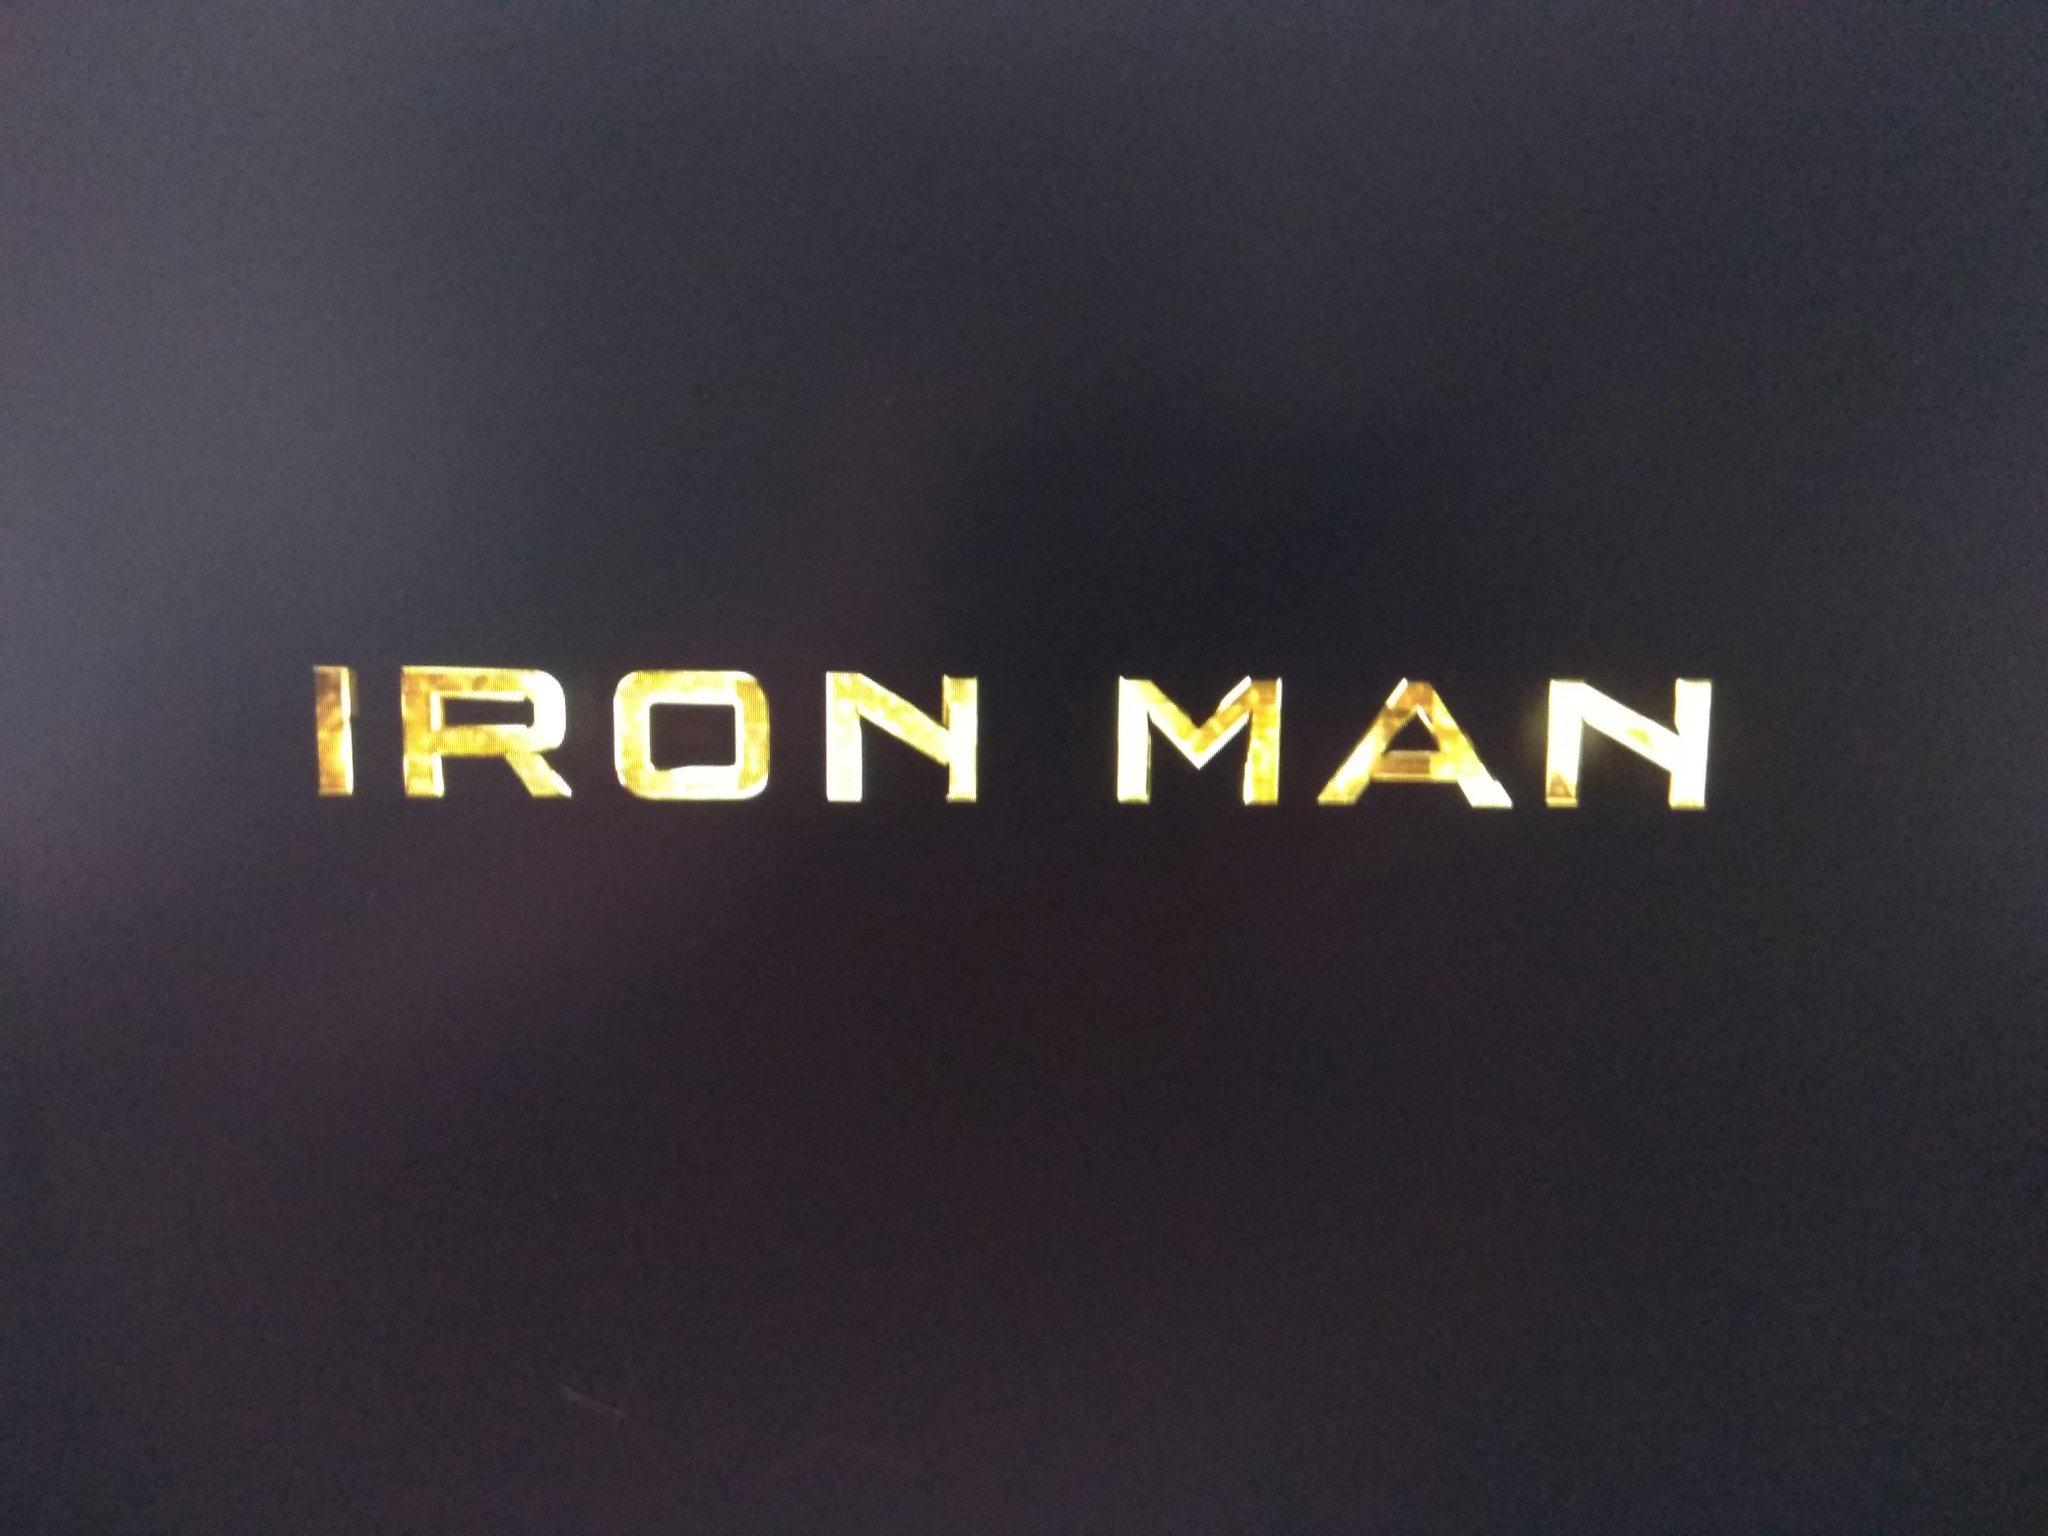 first marvel intro logo iron man 2008 - 1365×767